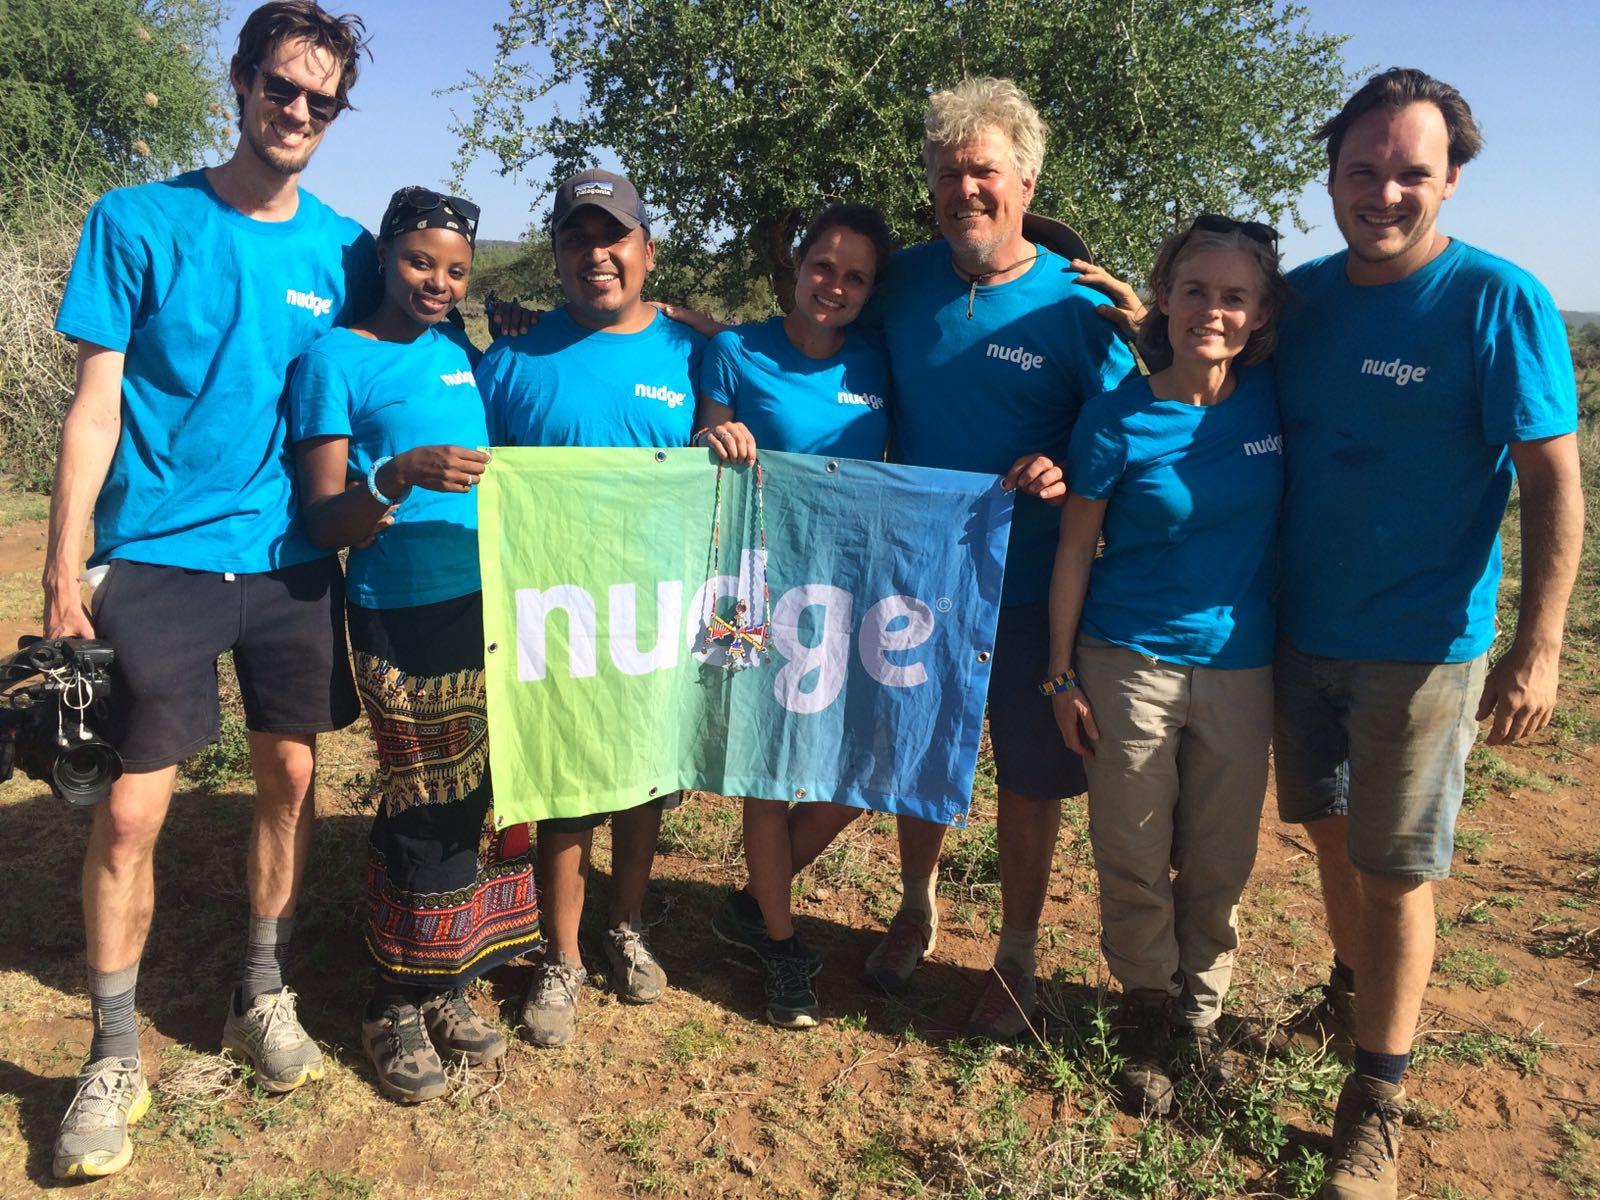 Nudge Team, (FLTR) : Paul Reehorst, Precious Mudia, Jesse lopez, Anne Boer, Jan van Betten, Ilse Lettinga and Geert van der Linden.